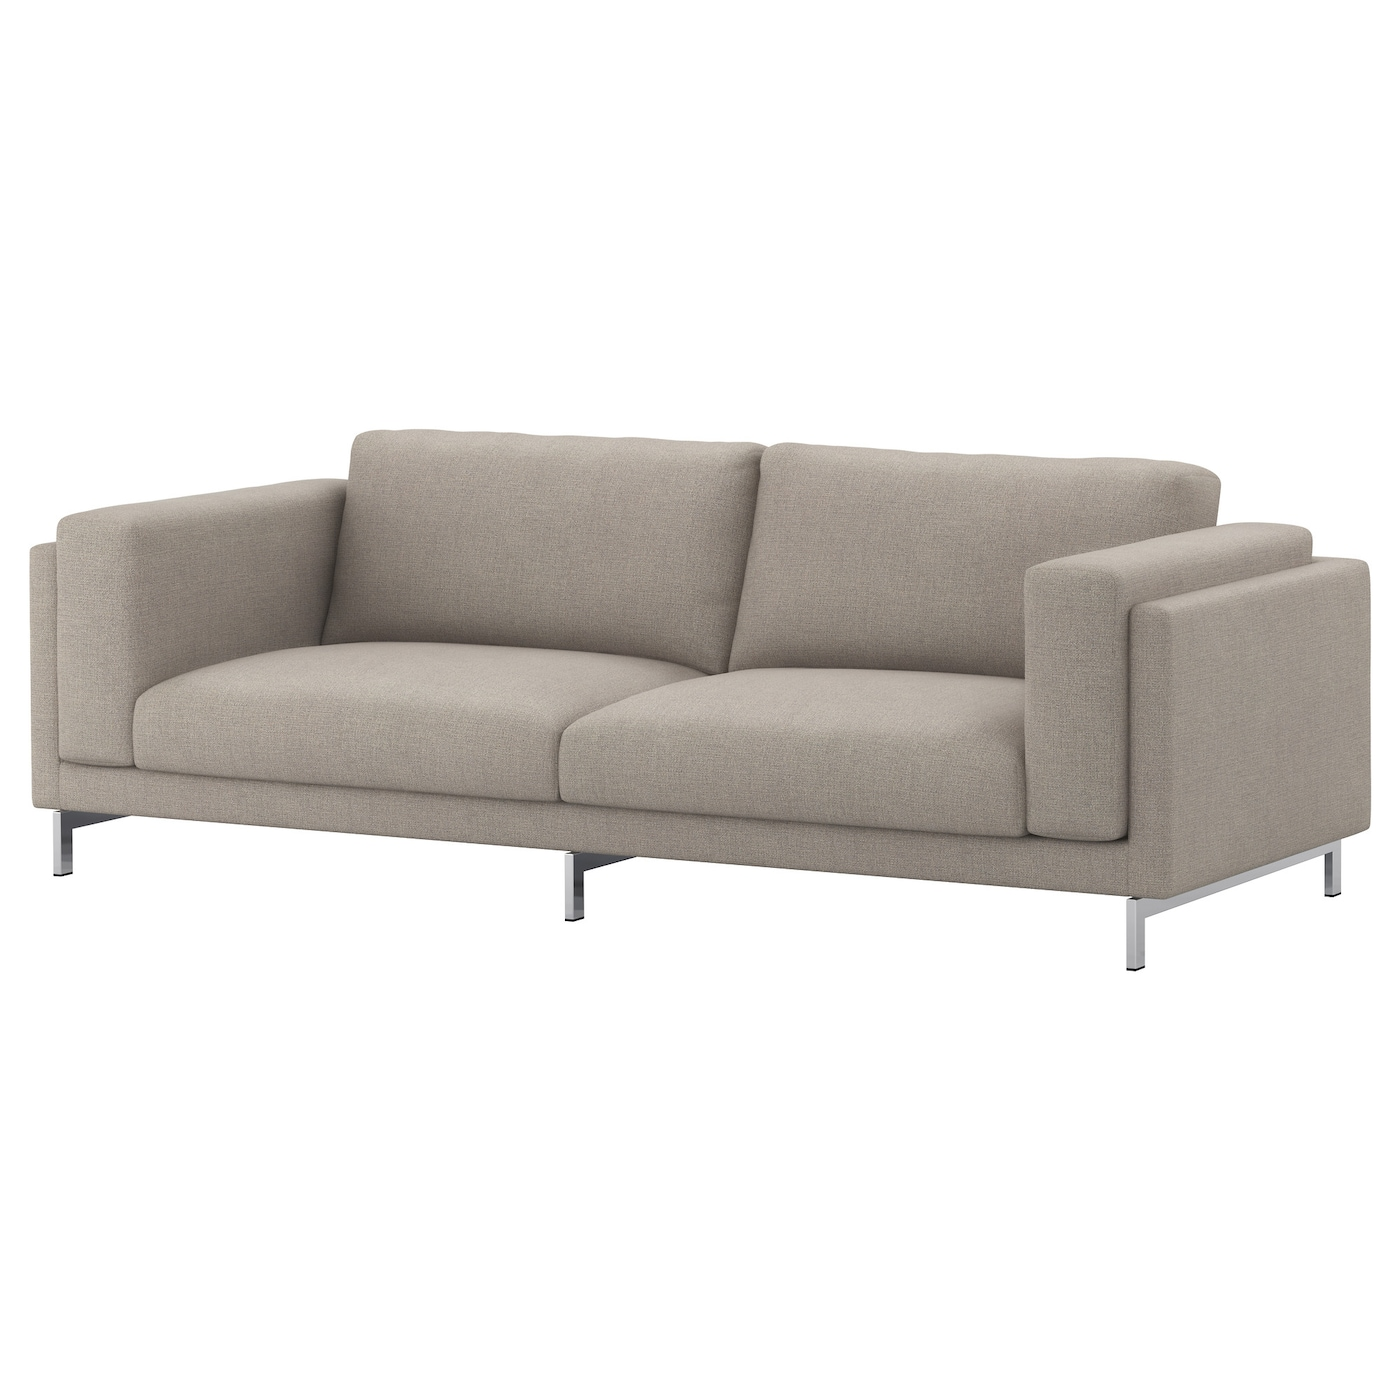 Nockeby legs for 3 seat sofa chrome plated ikea for Sofa nockeby